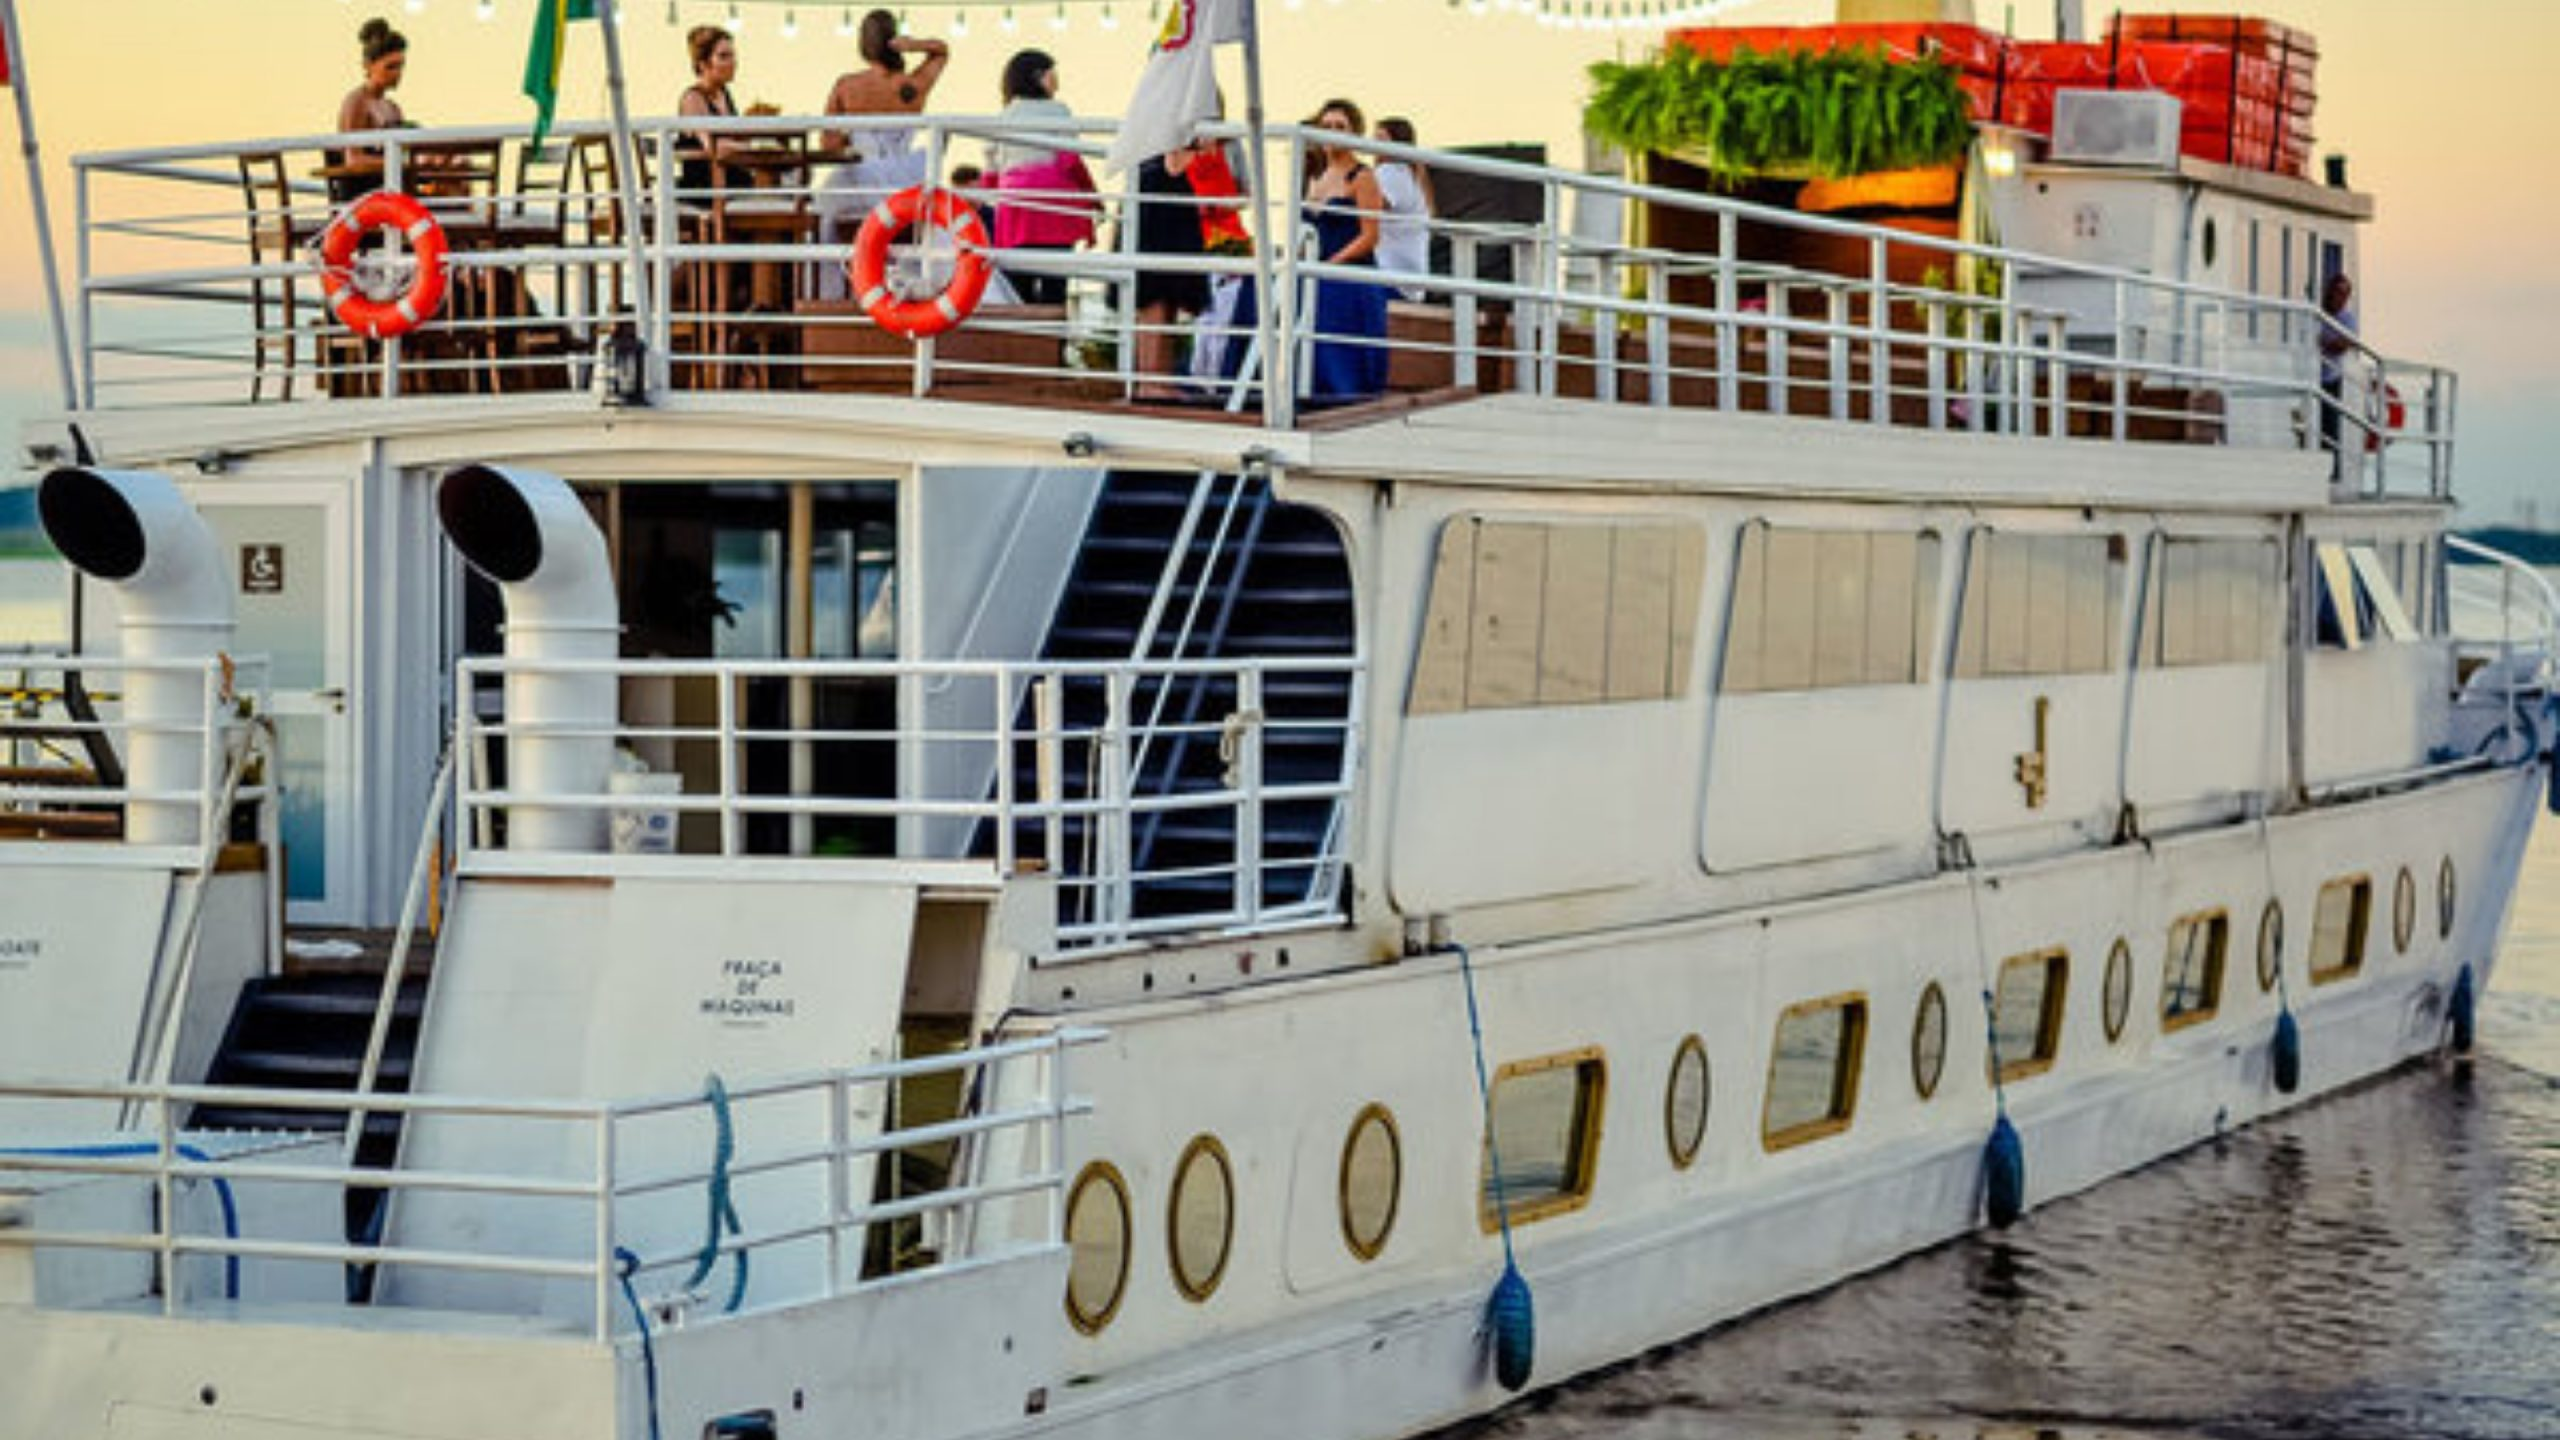 Passeio no Barco Cisne Branco